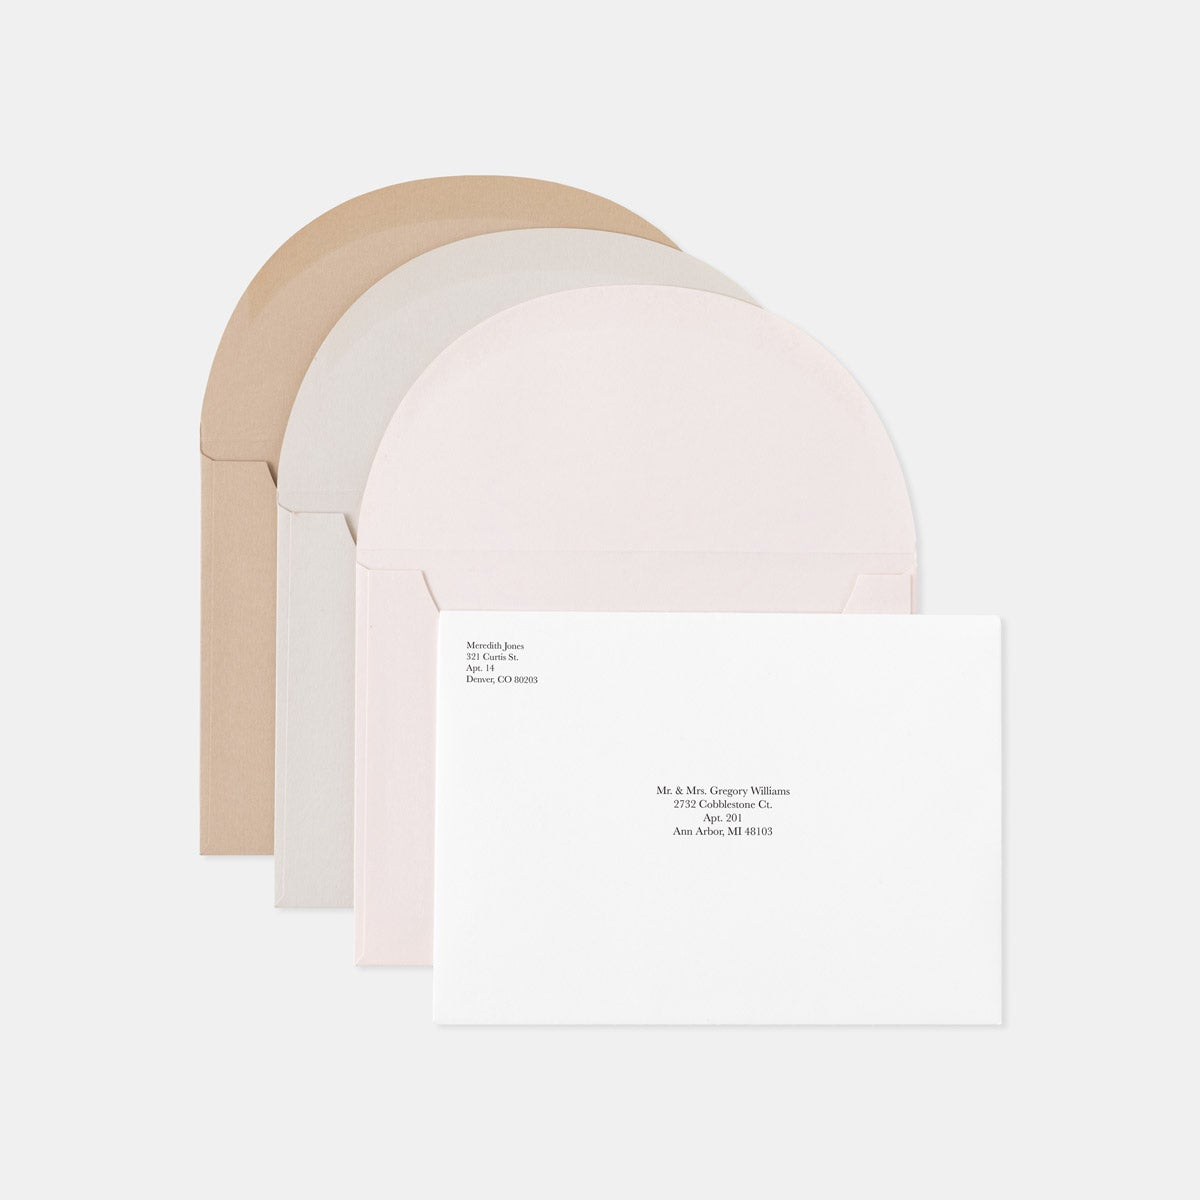 Letterpress Elemental Thank You Card